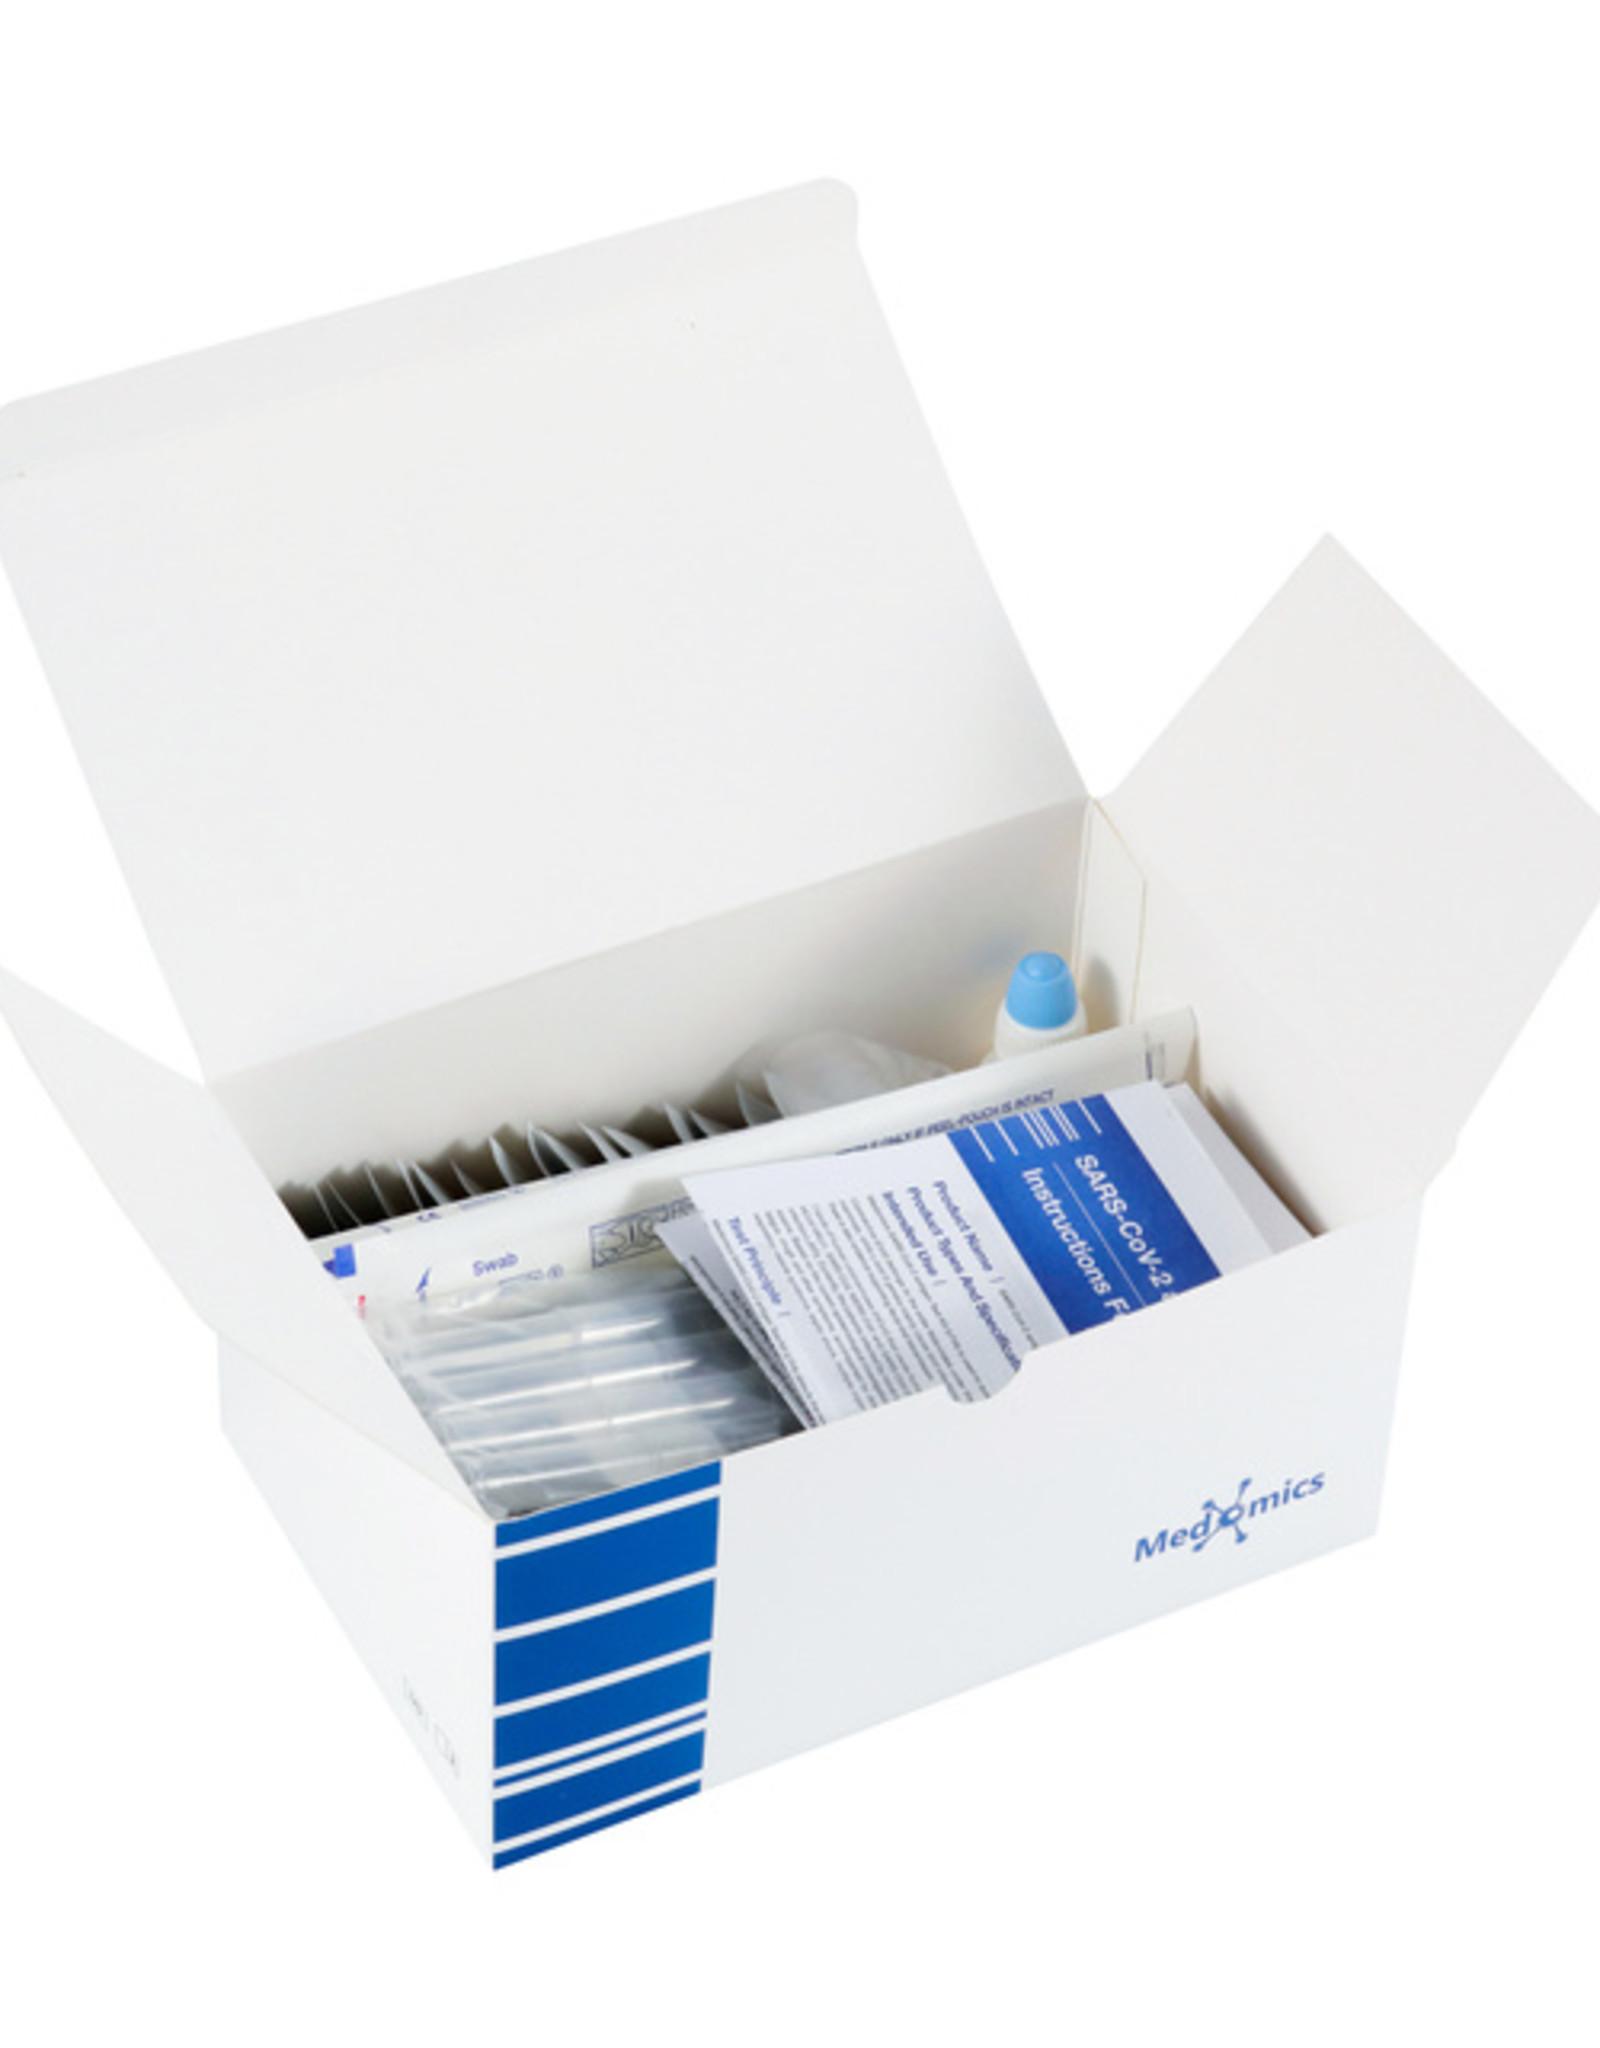 COVID 19 - SARS-CoV-2 Antigen  (LFIA) - 20 tests